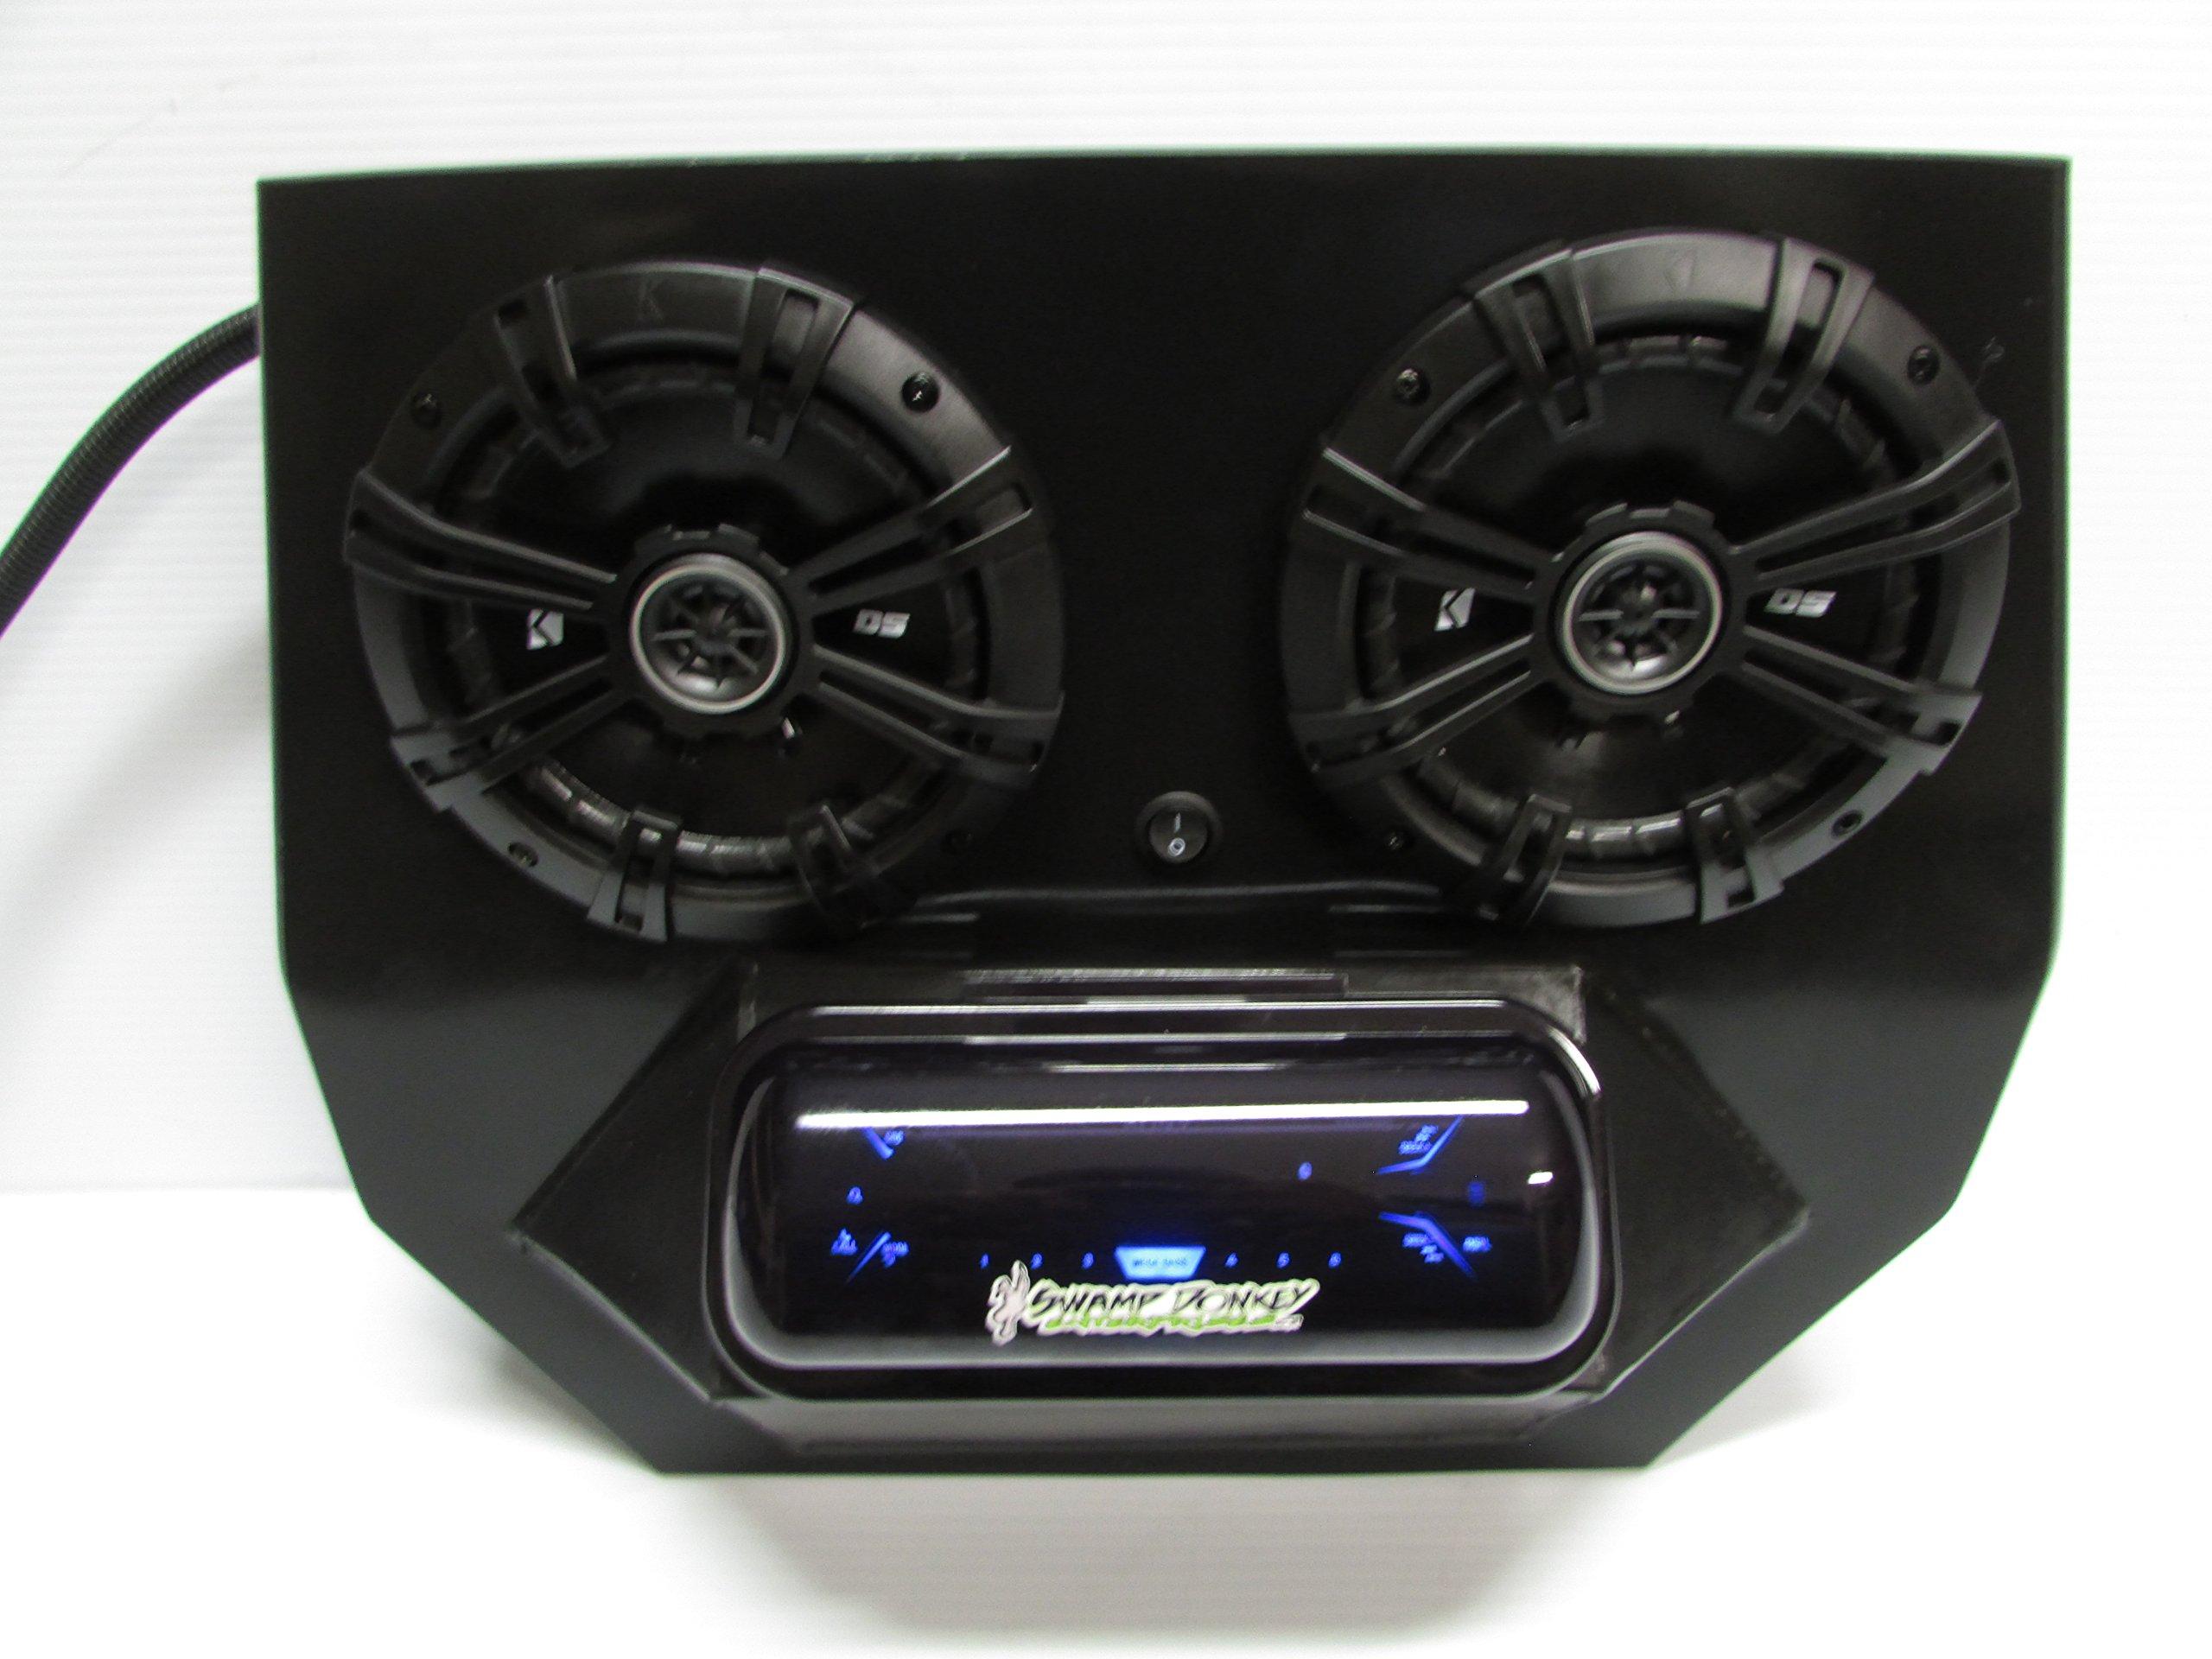 SD 2BBT2B -Polaris RZR Stereo System Bluetooth UTV Side by Side (2-6.5'' marine speakers)